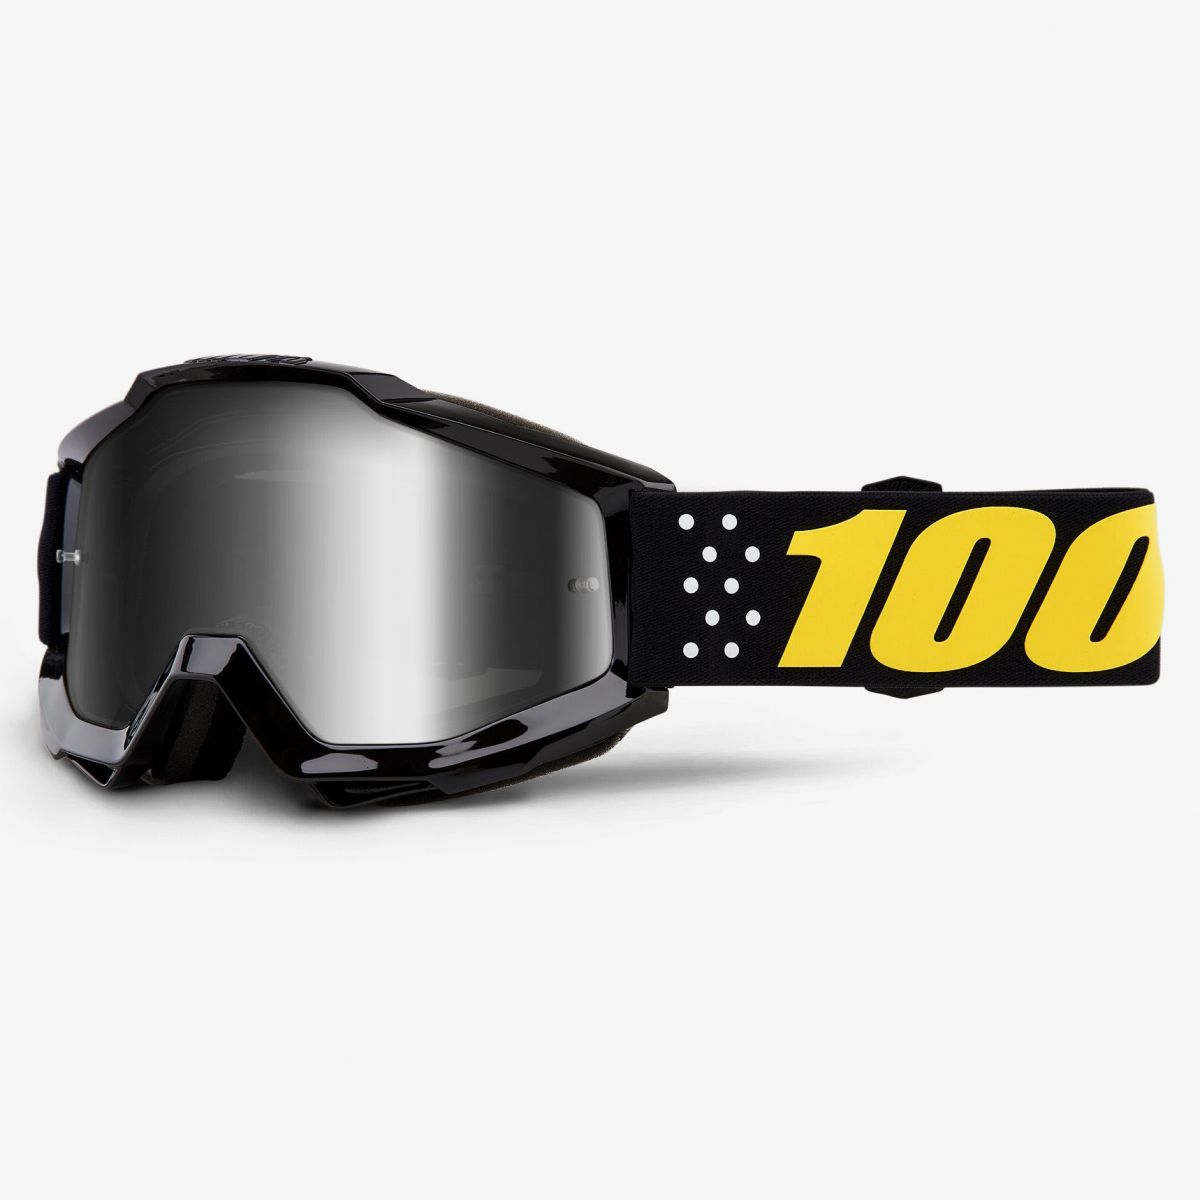 100% - Accuri Pistol Mirror Lens, очки, зеркальная линза